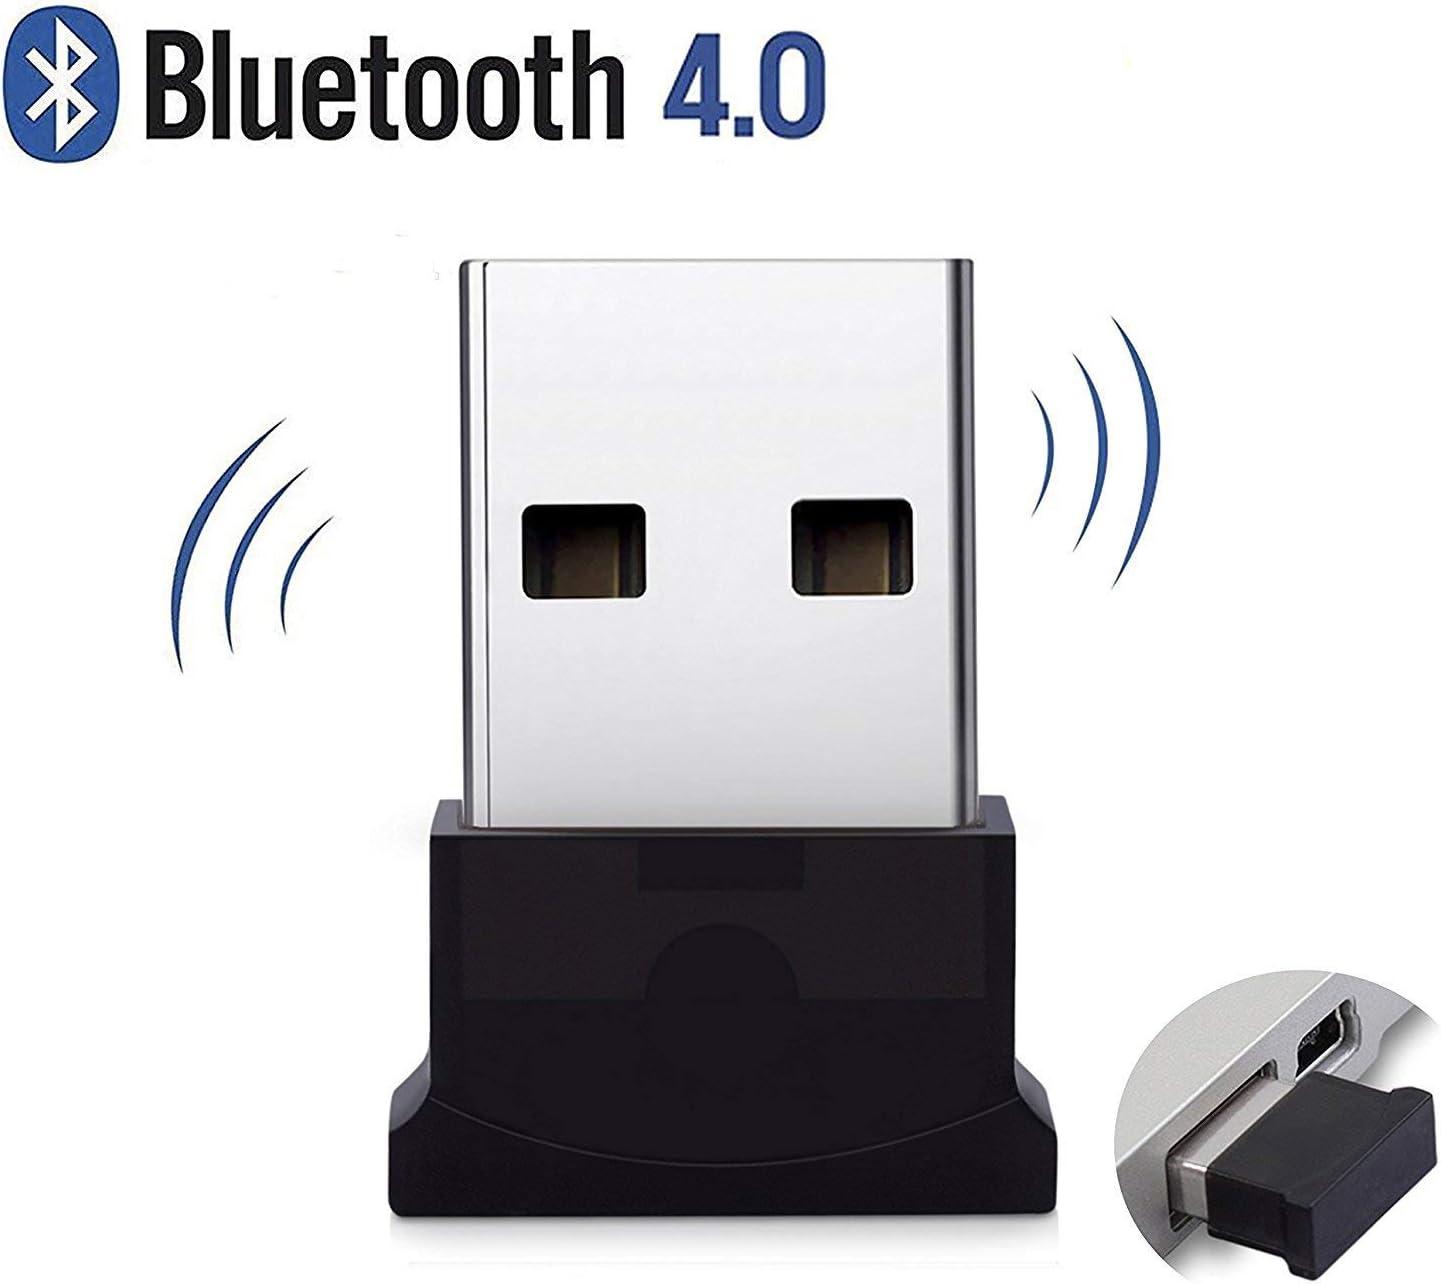 Multiform Bluetooth CSR 4.0 Dongle 2.0 USB Wireless Adapter For PC Laptop Windows XP/Vista